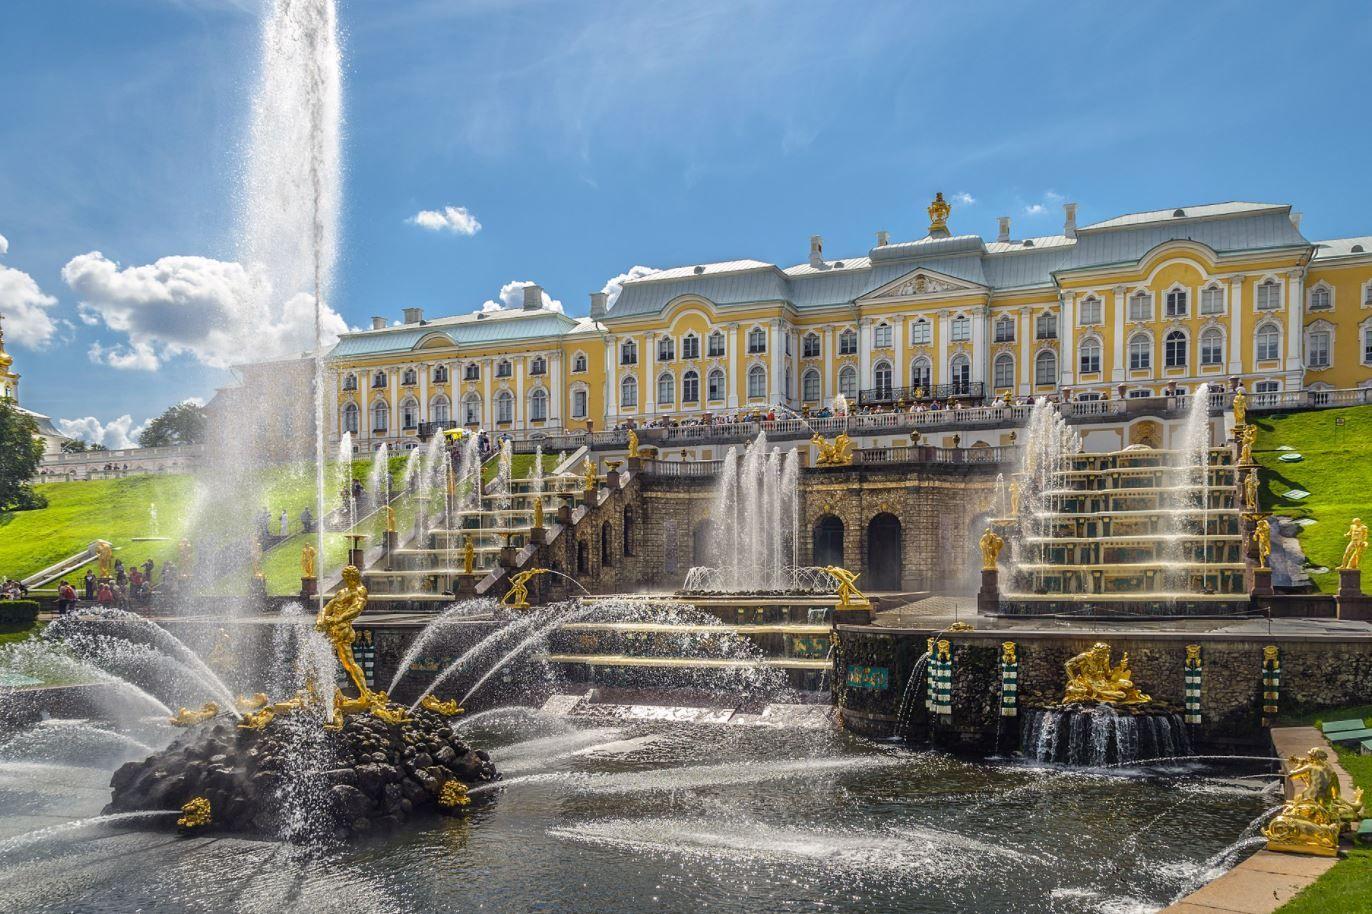 Magnificient Mansions - Peterhof